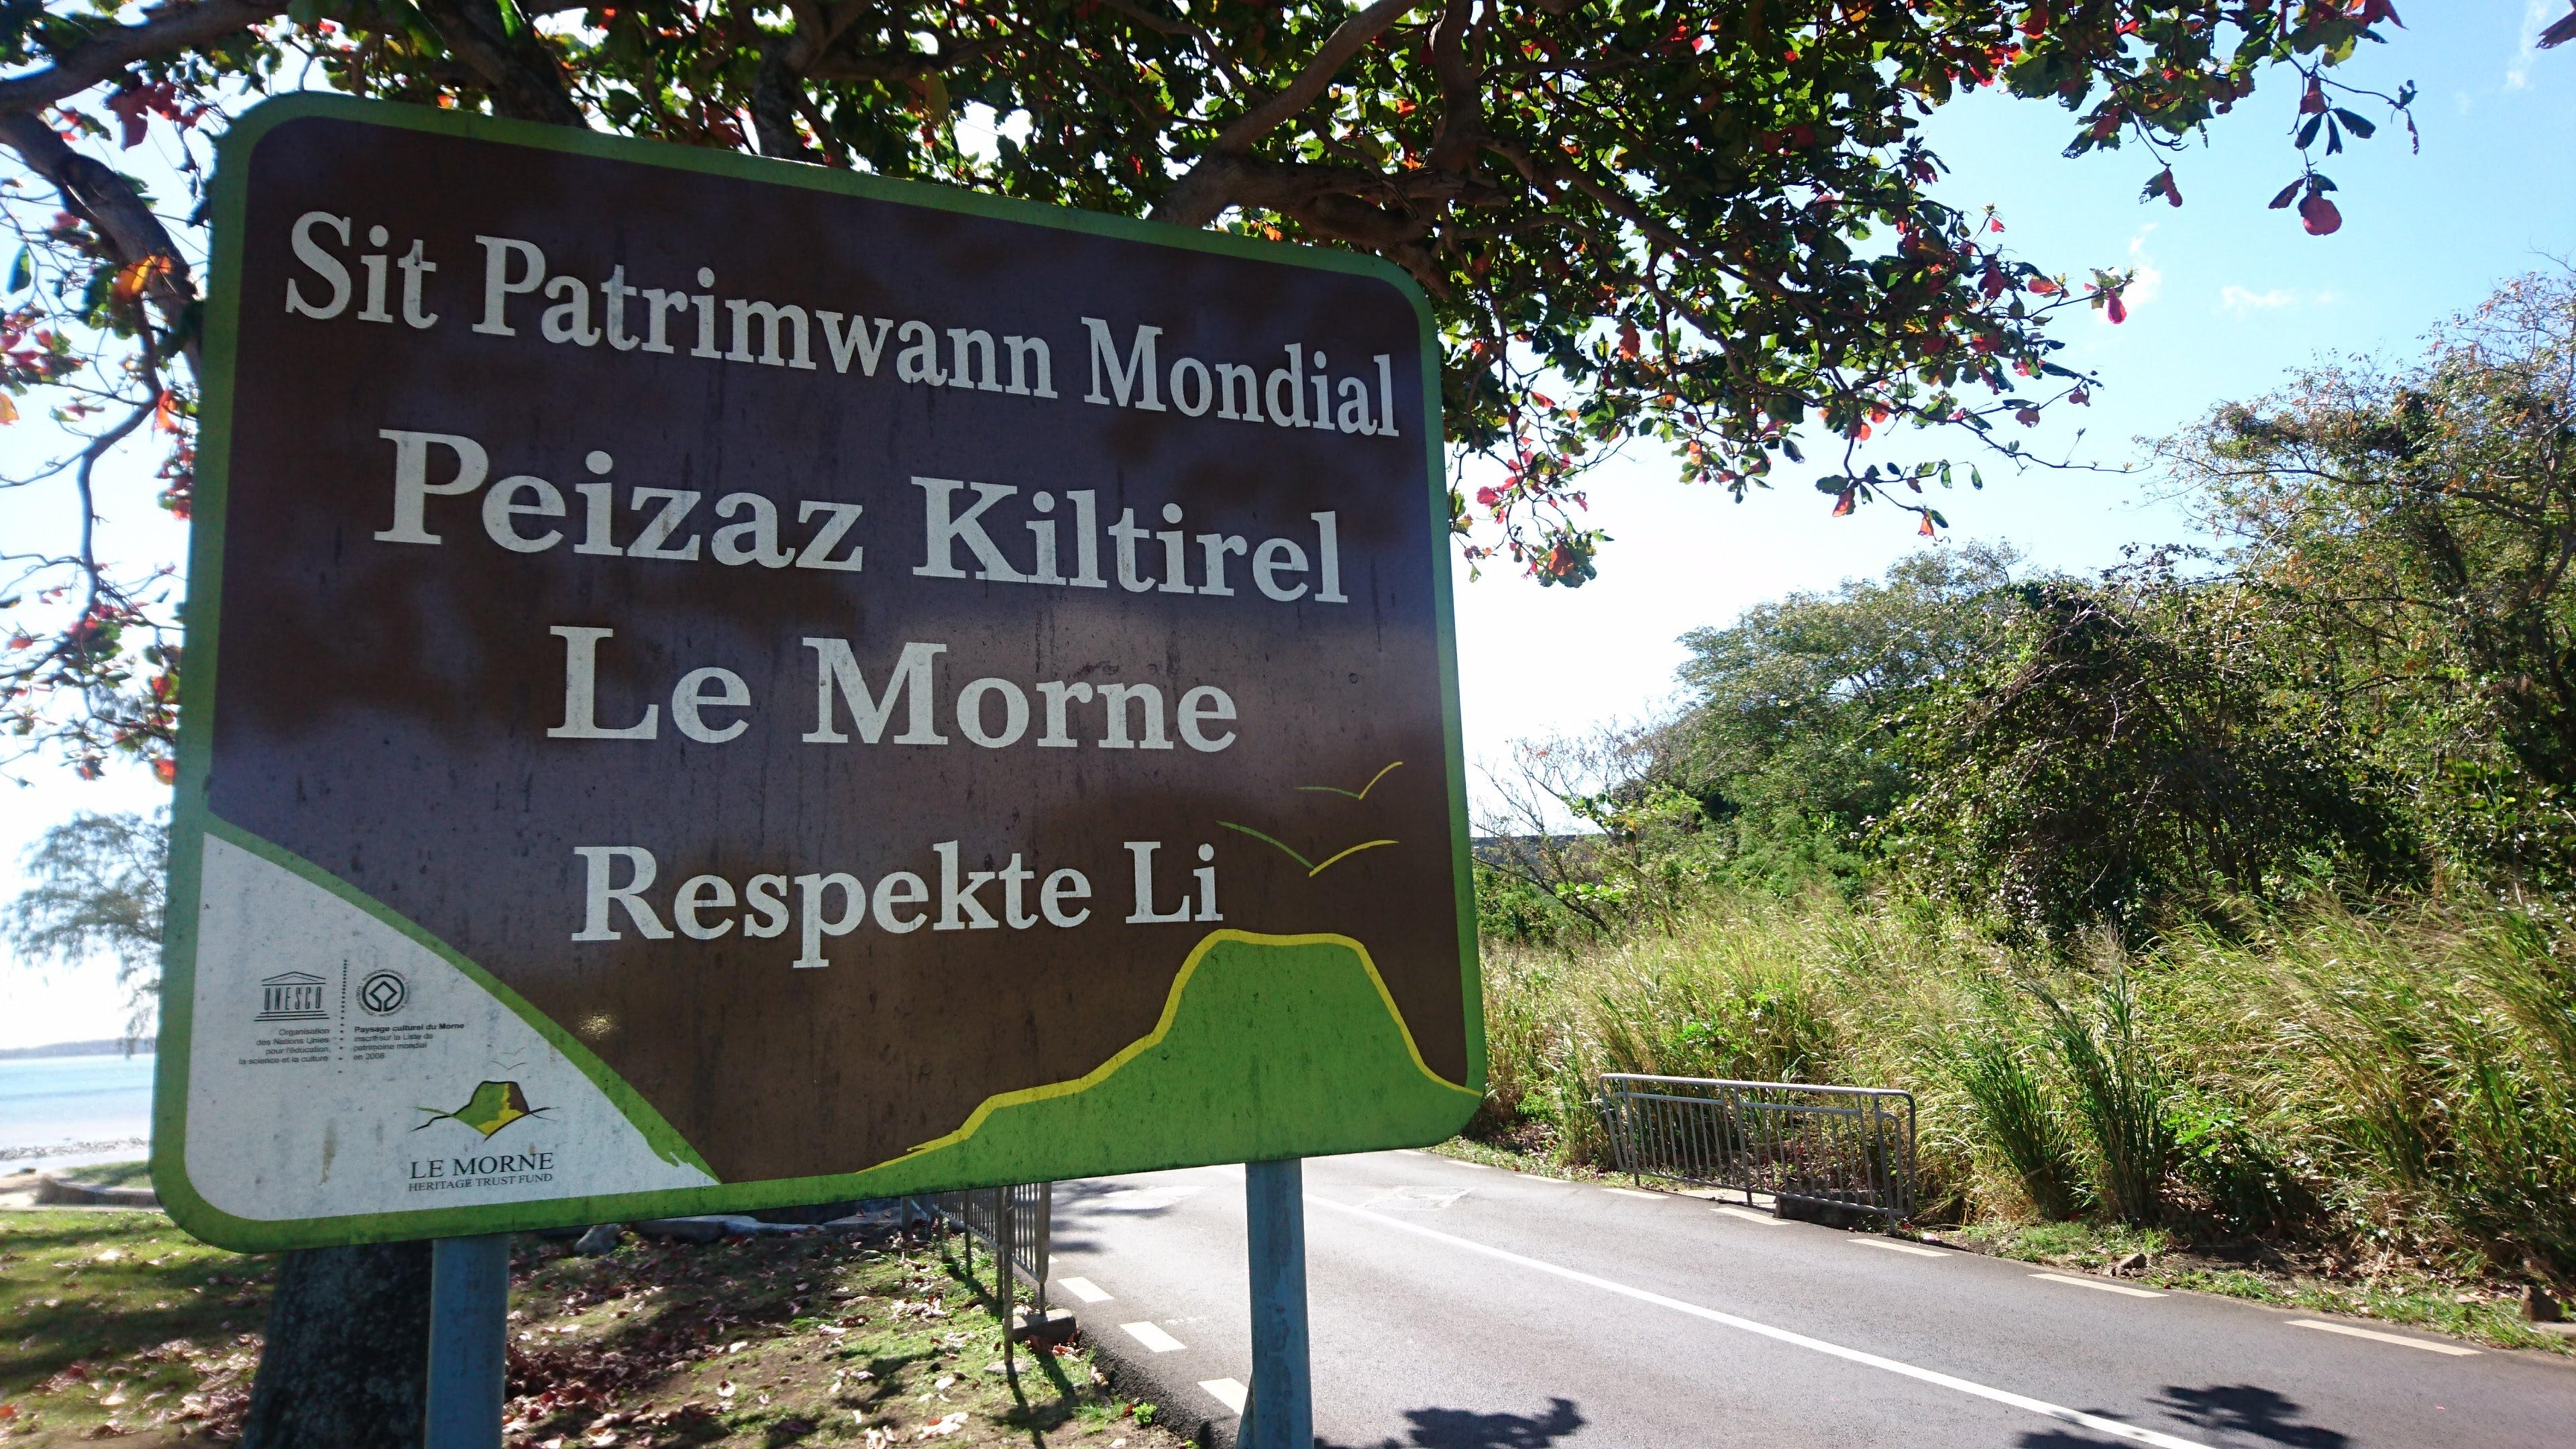 Mauritian Creole Wikipedia